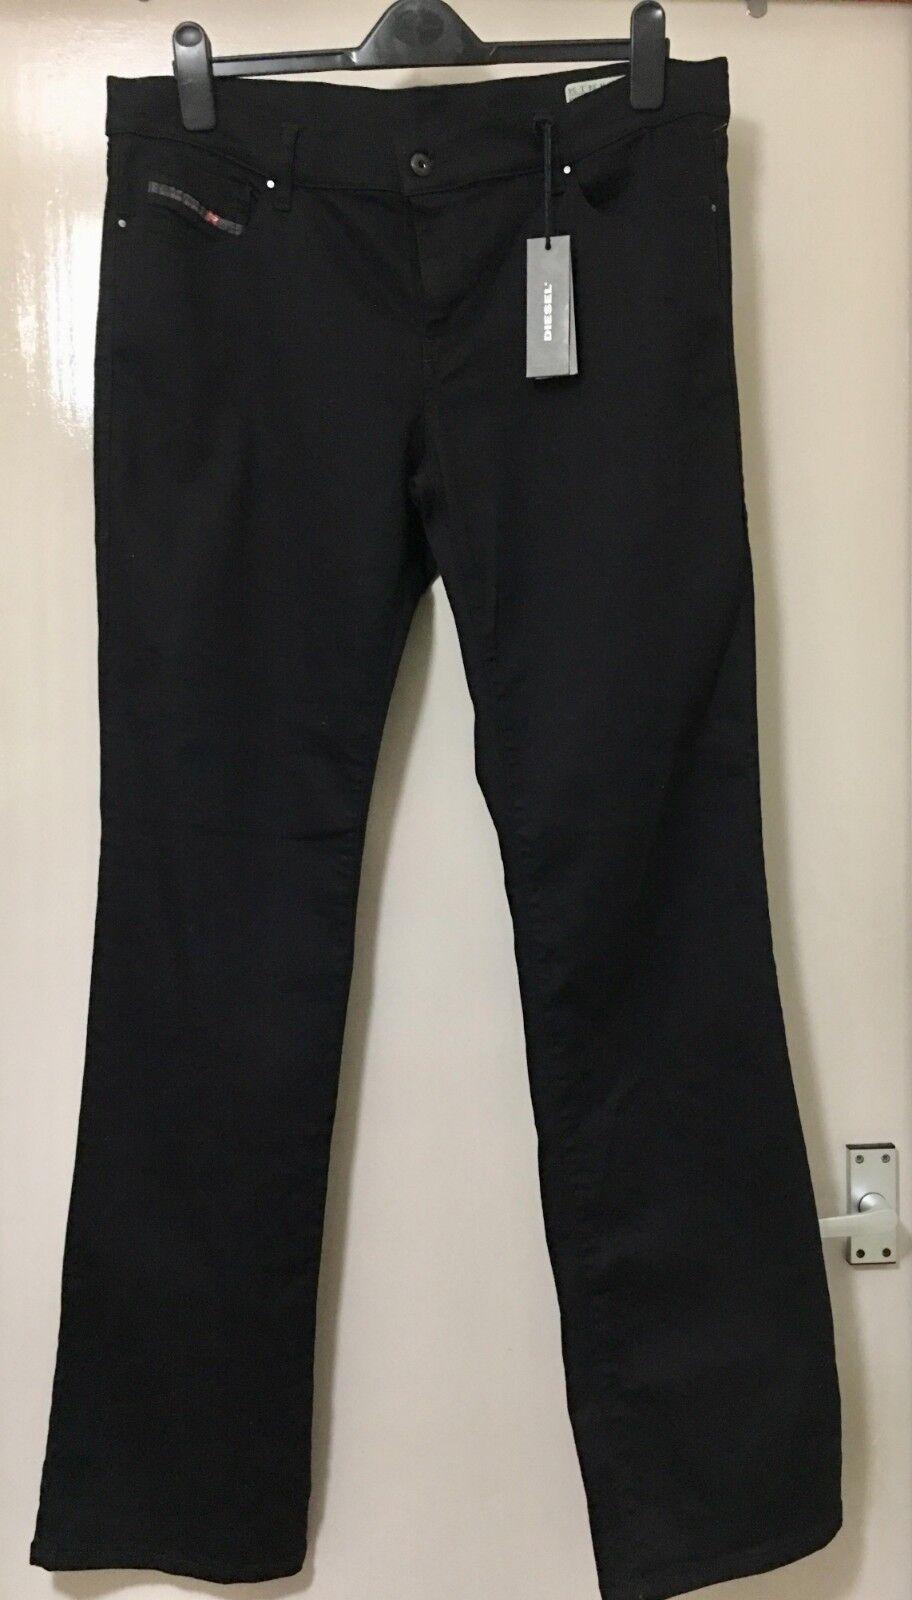 uomo DIESEL elastico regolare Slim avvio Cut Jeans Nero taglia 34W 34L ITALIA MADE